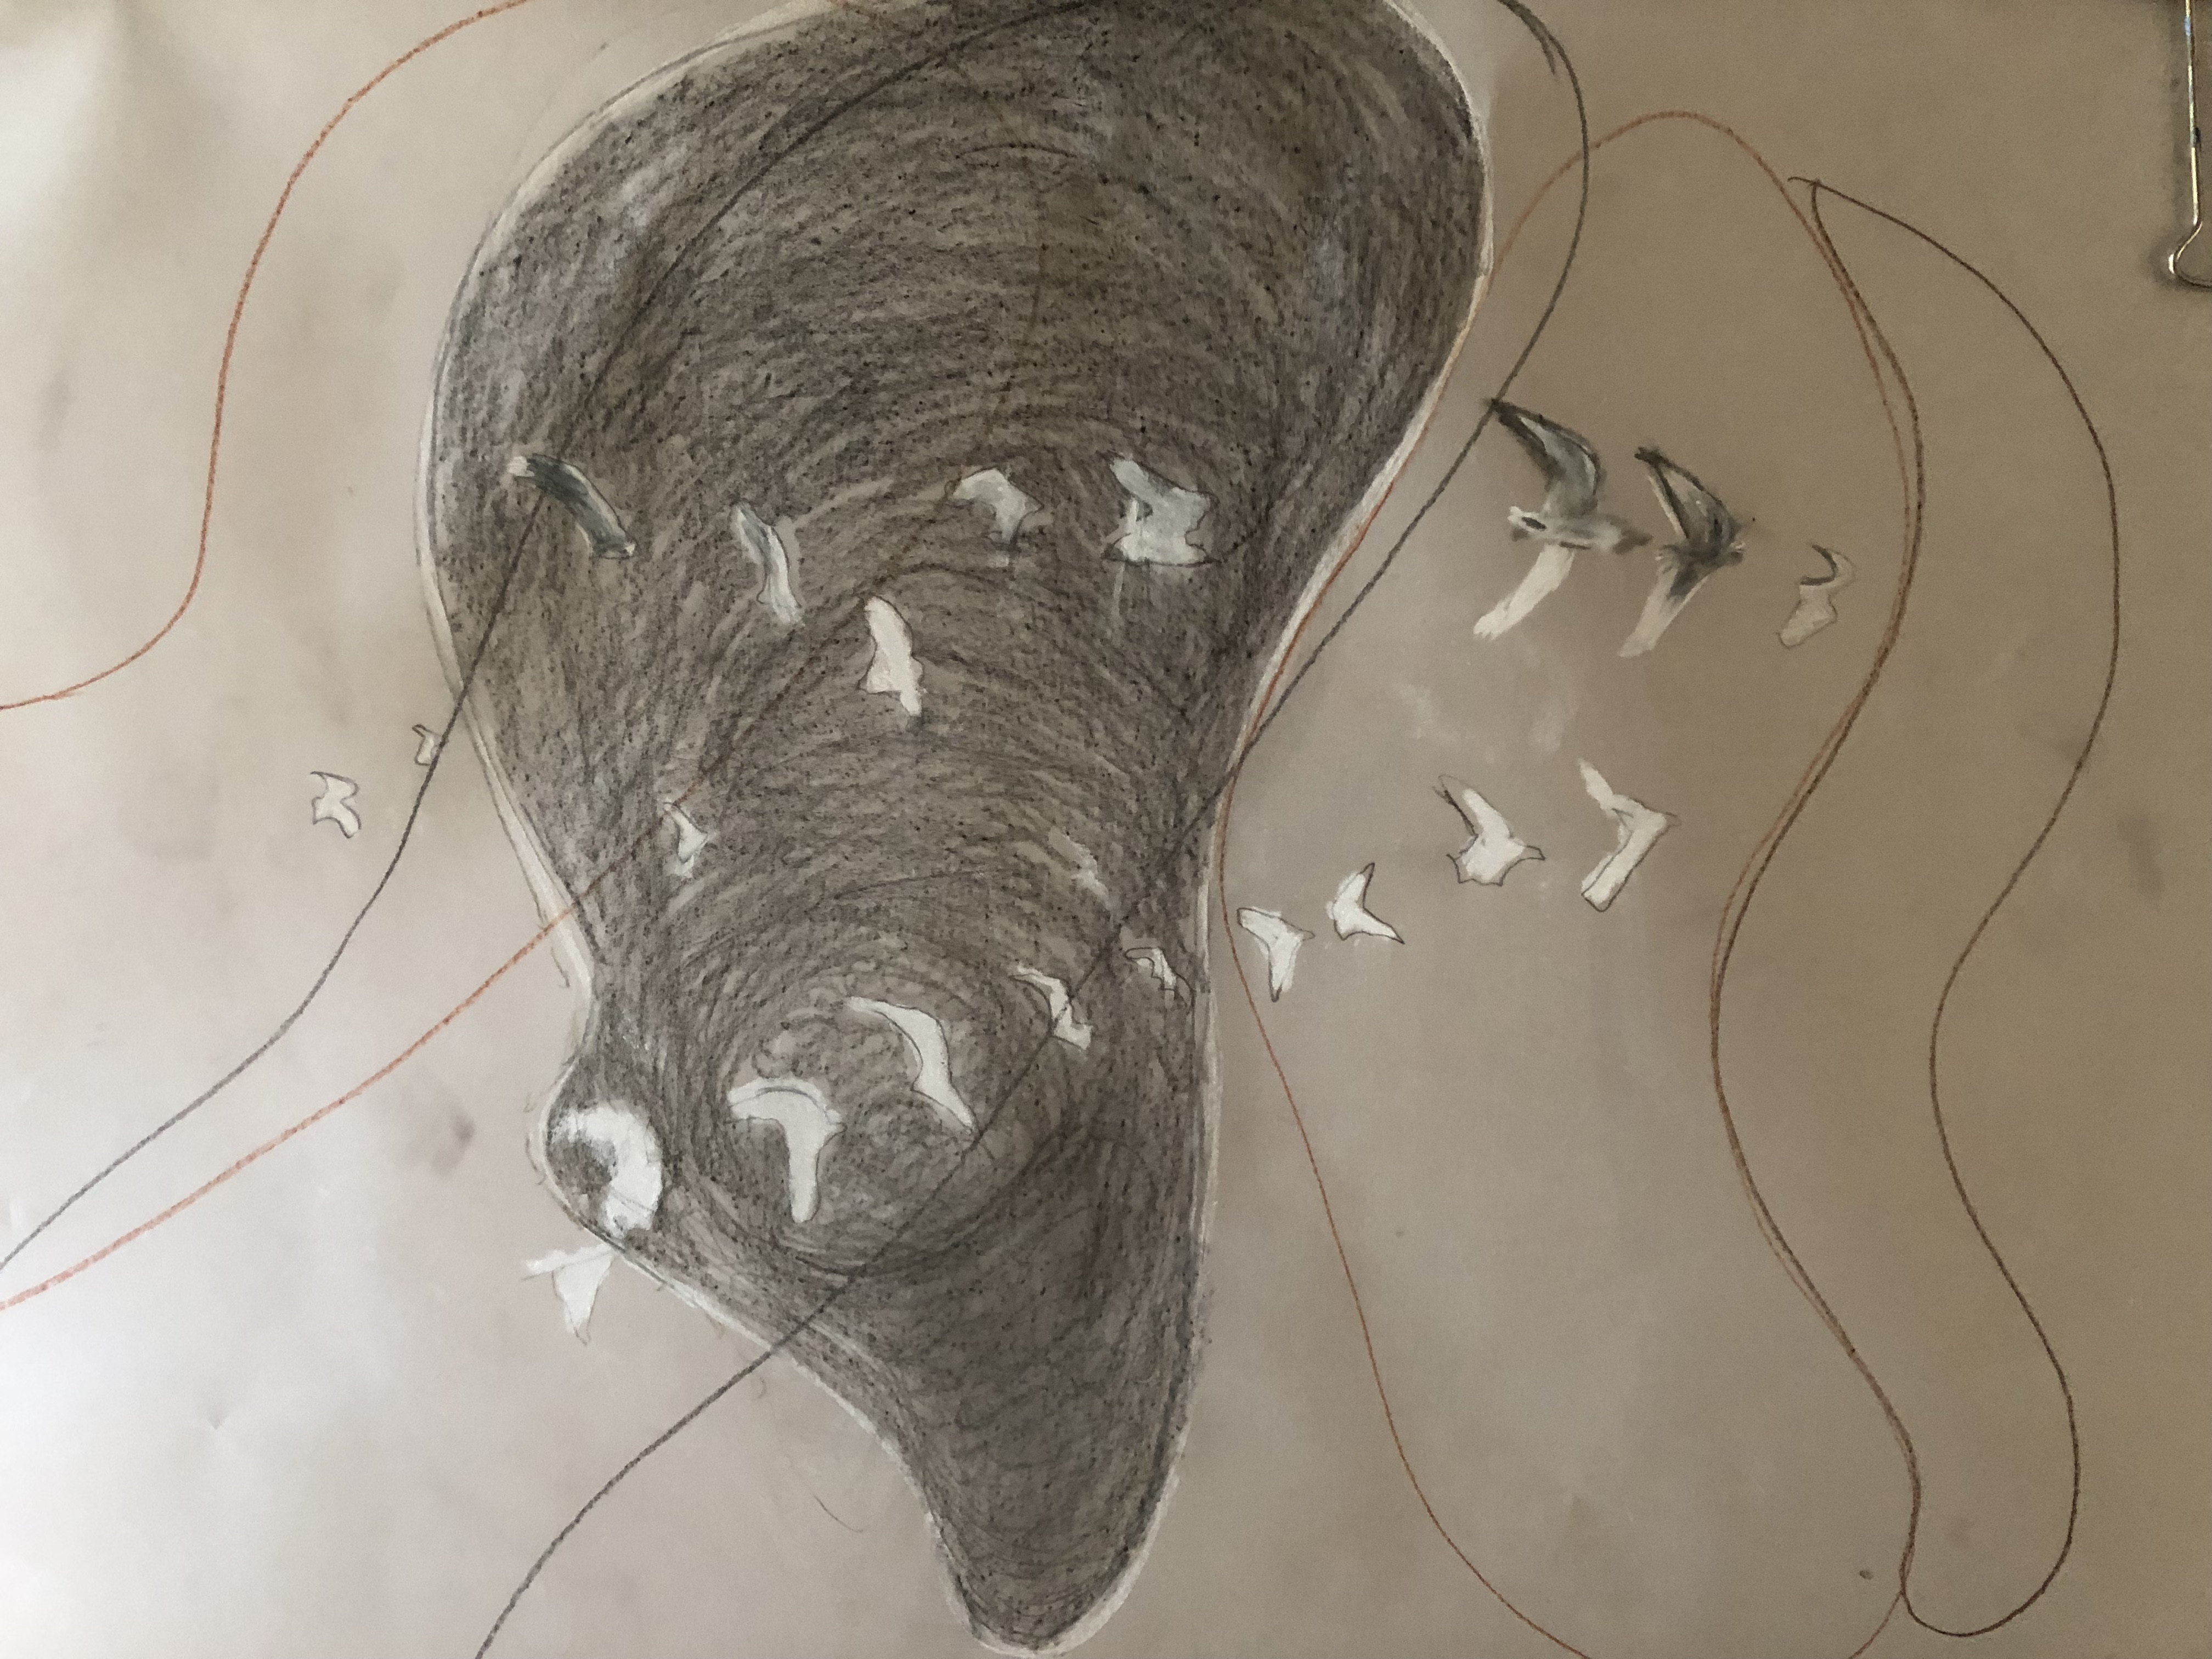 gulls on vellum paper